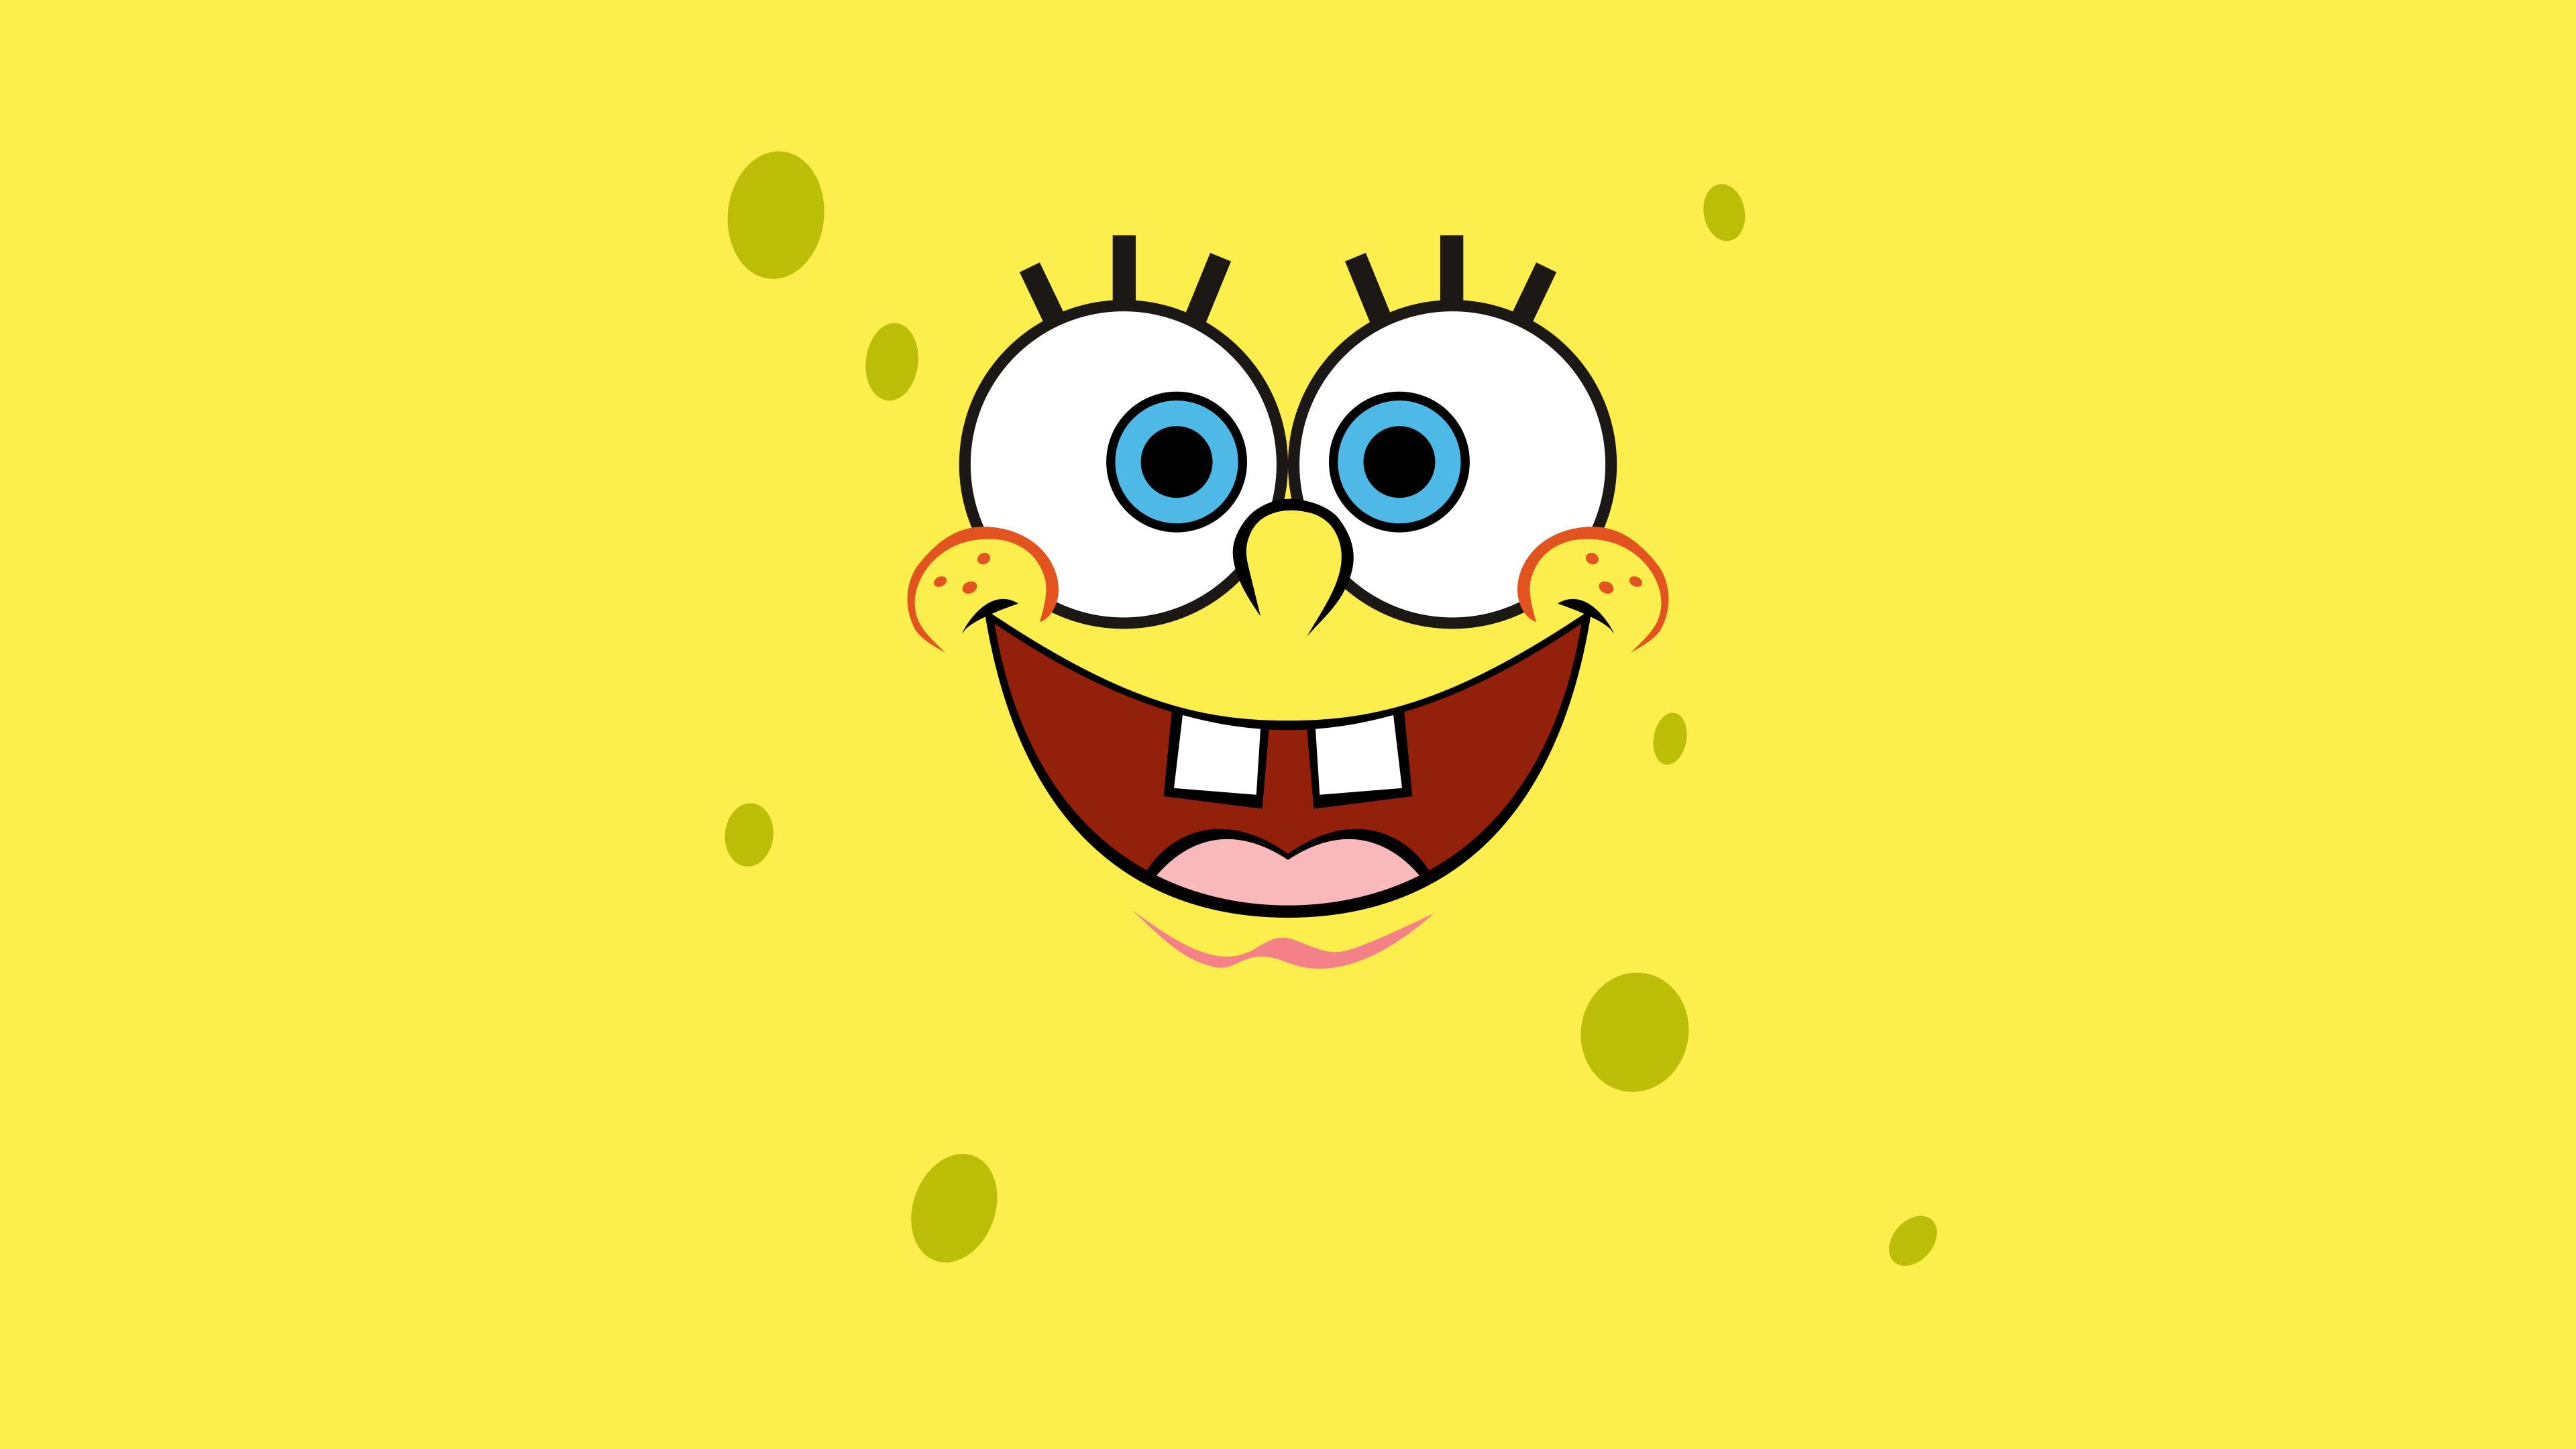 General 3840x2160 caricature Bob Eggleton SpongeBob SquarePants TV Series cartoon face simple background yellow background yellow humor